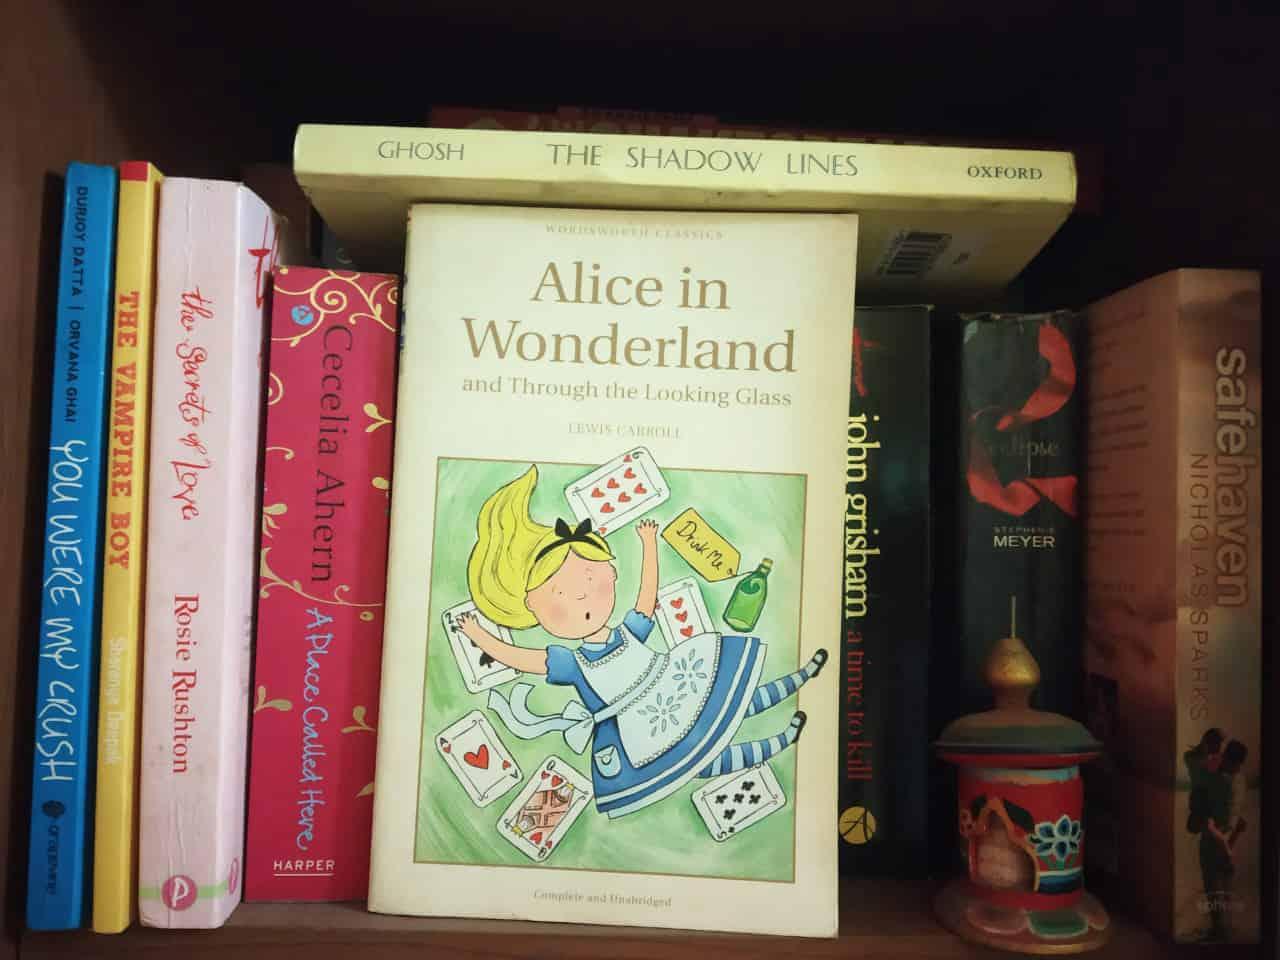 Alices Adventures In Wonderland Childrens Storybook Or A World Of Violence